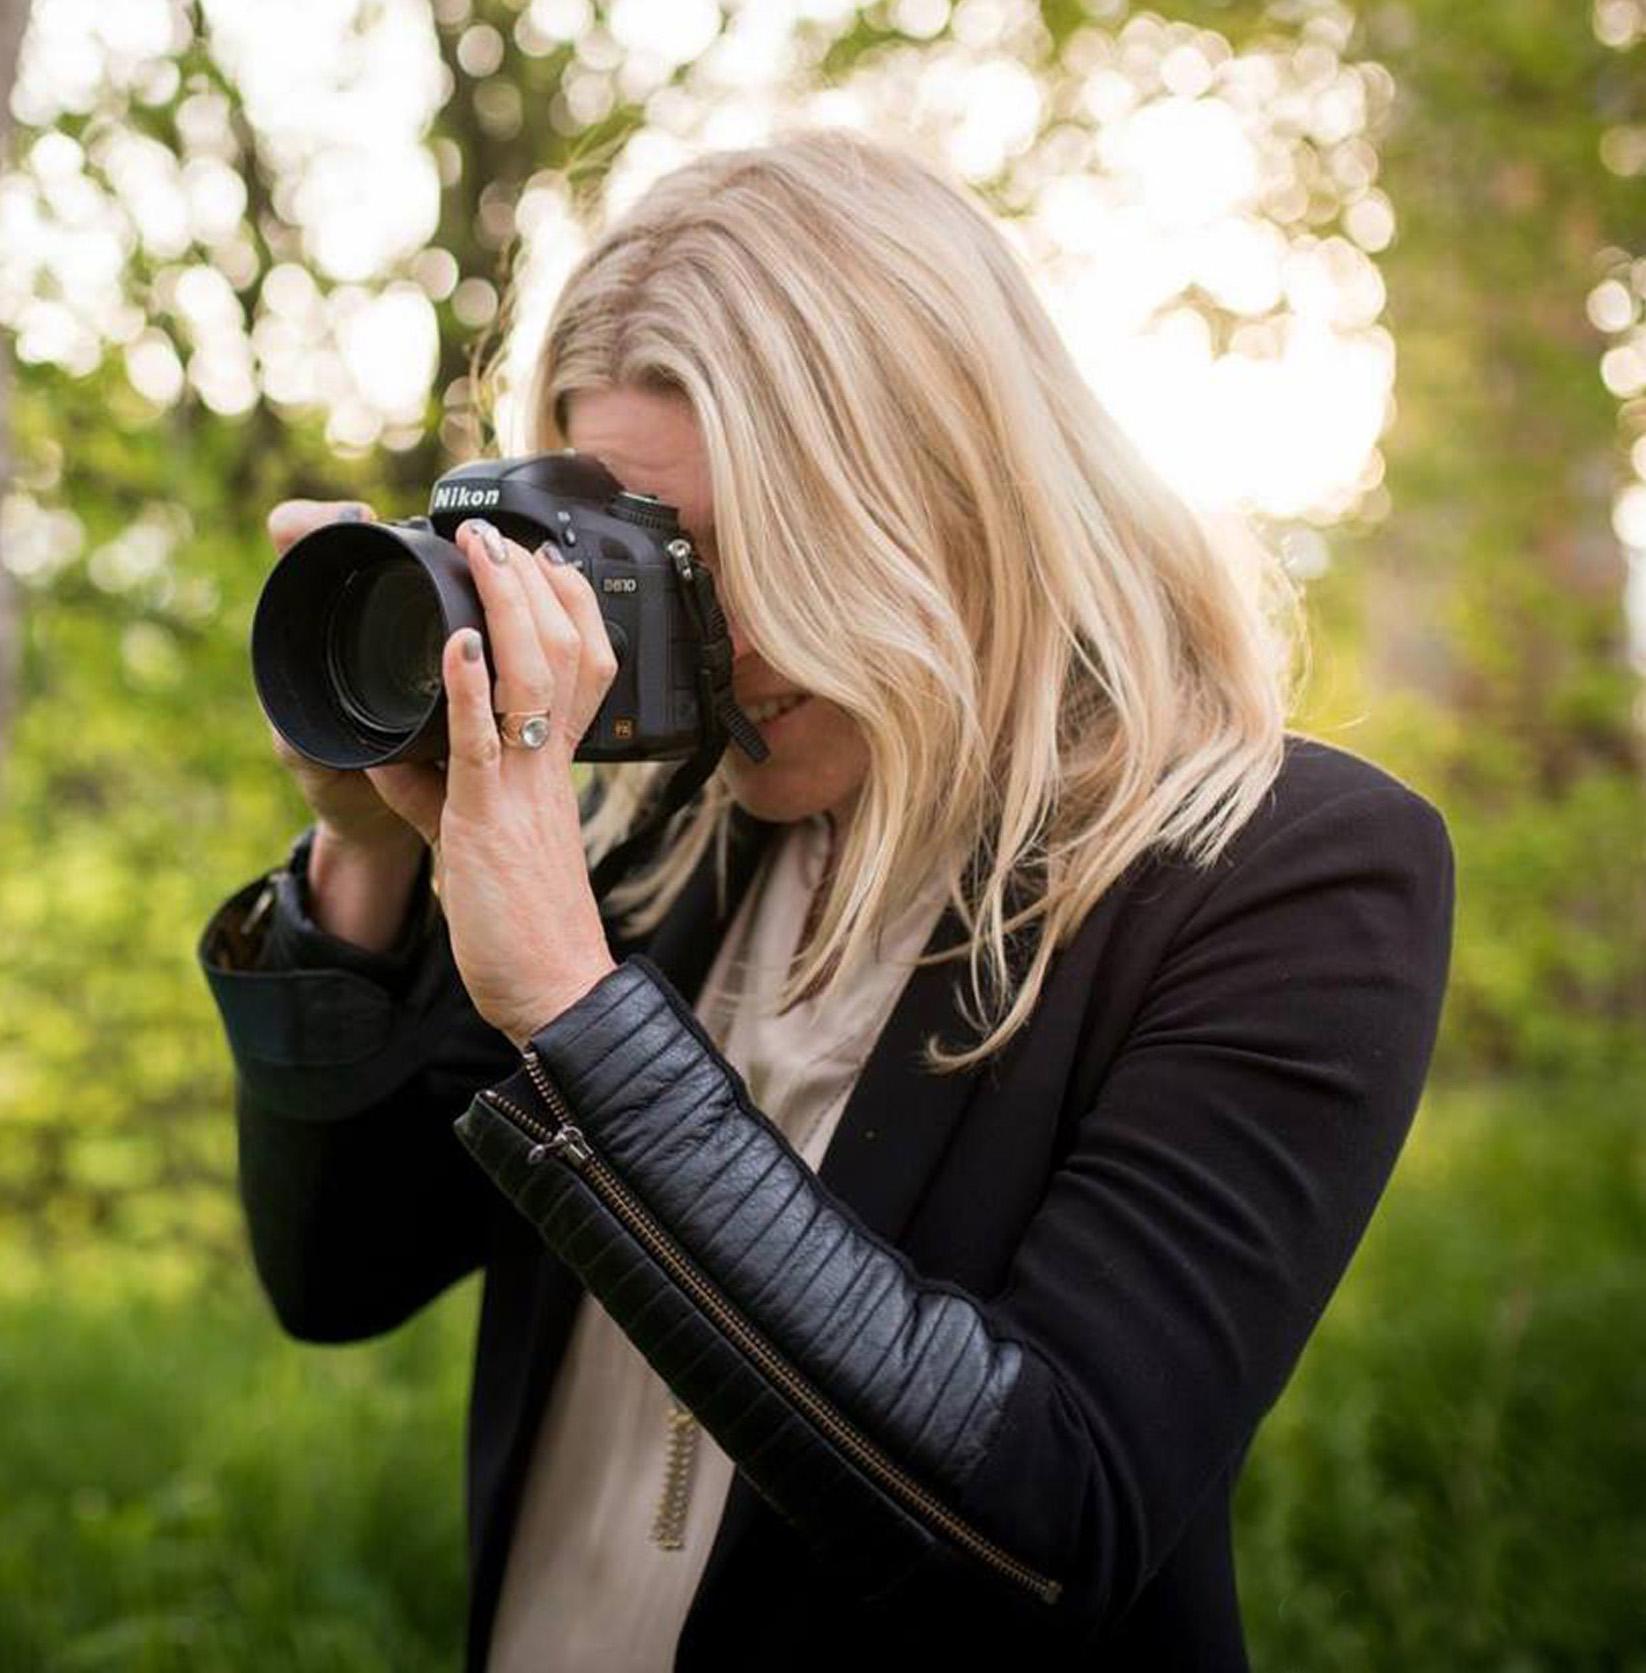 kirsten sudbury summers Auckland portrait sport wedding photographer